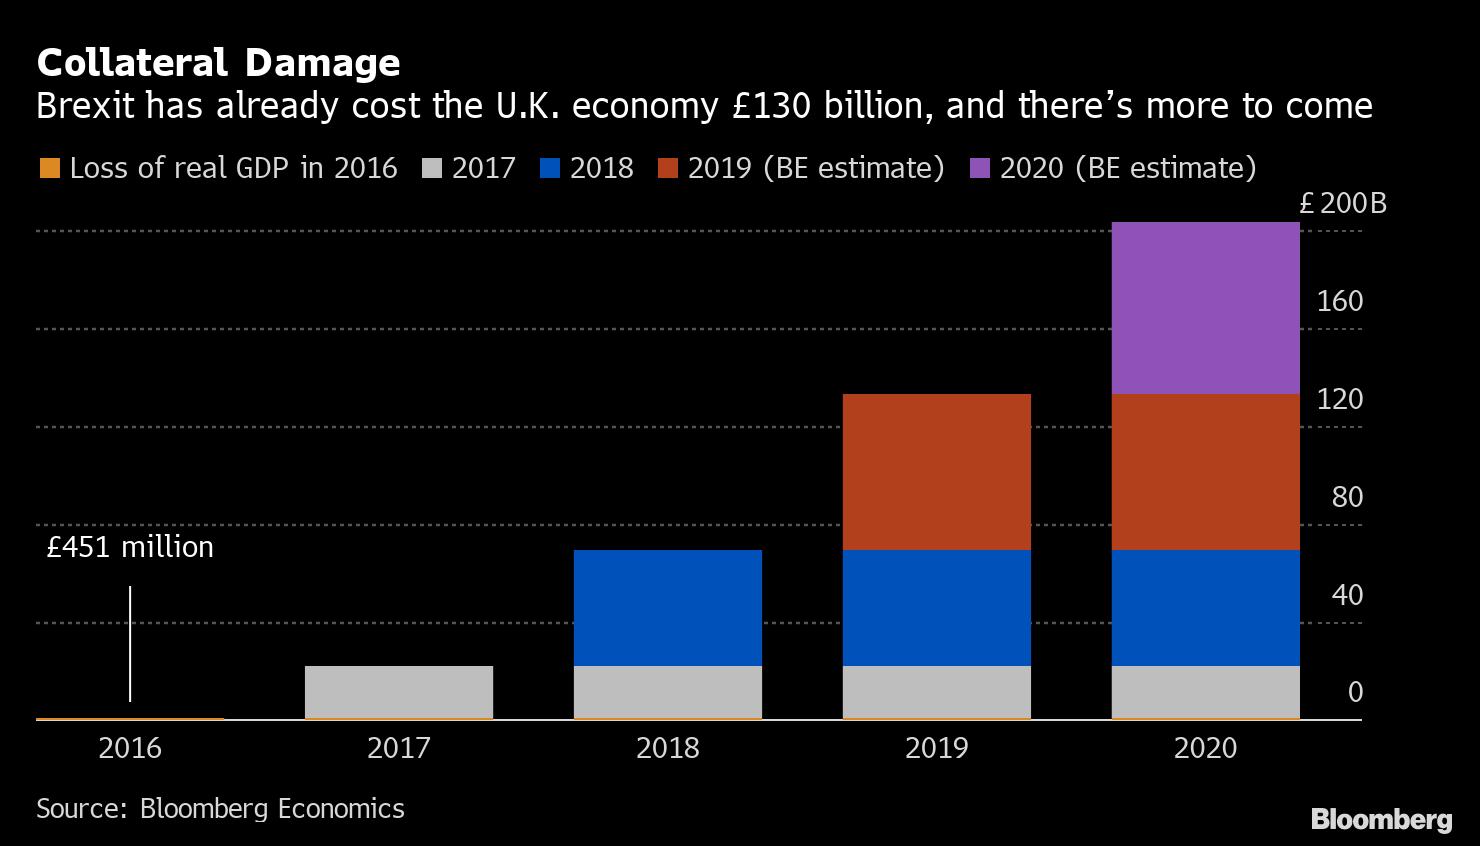 Brexit Cost After 'boris Bounce' Is Still $260 Billion regarding Economic Calendar Bloomberg